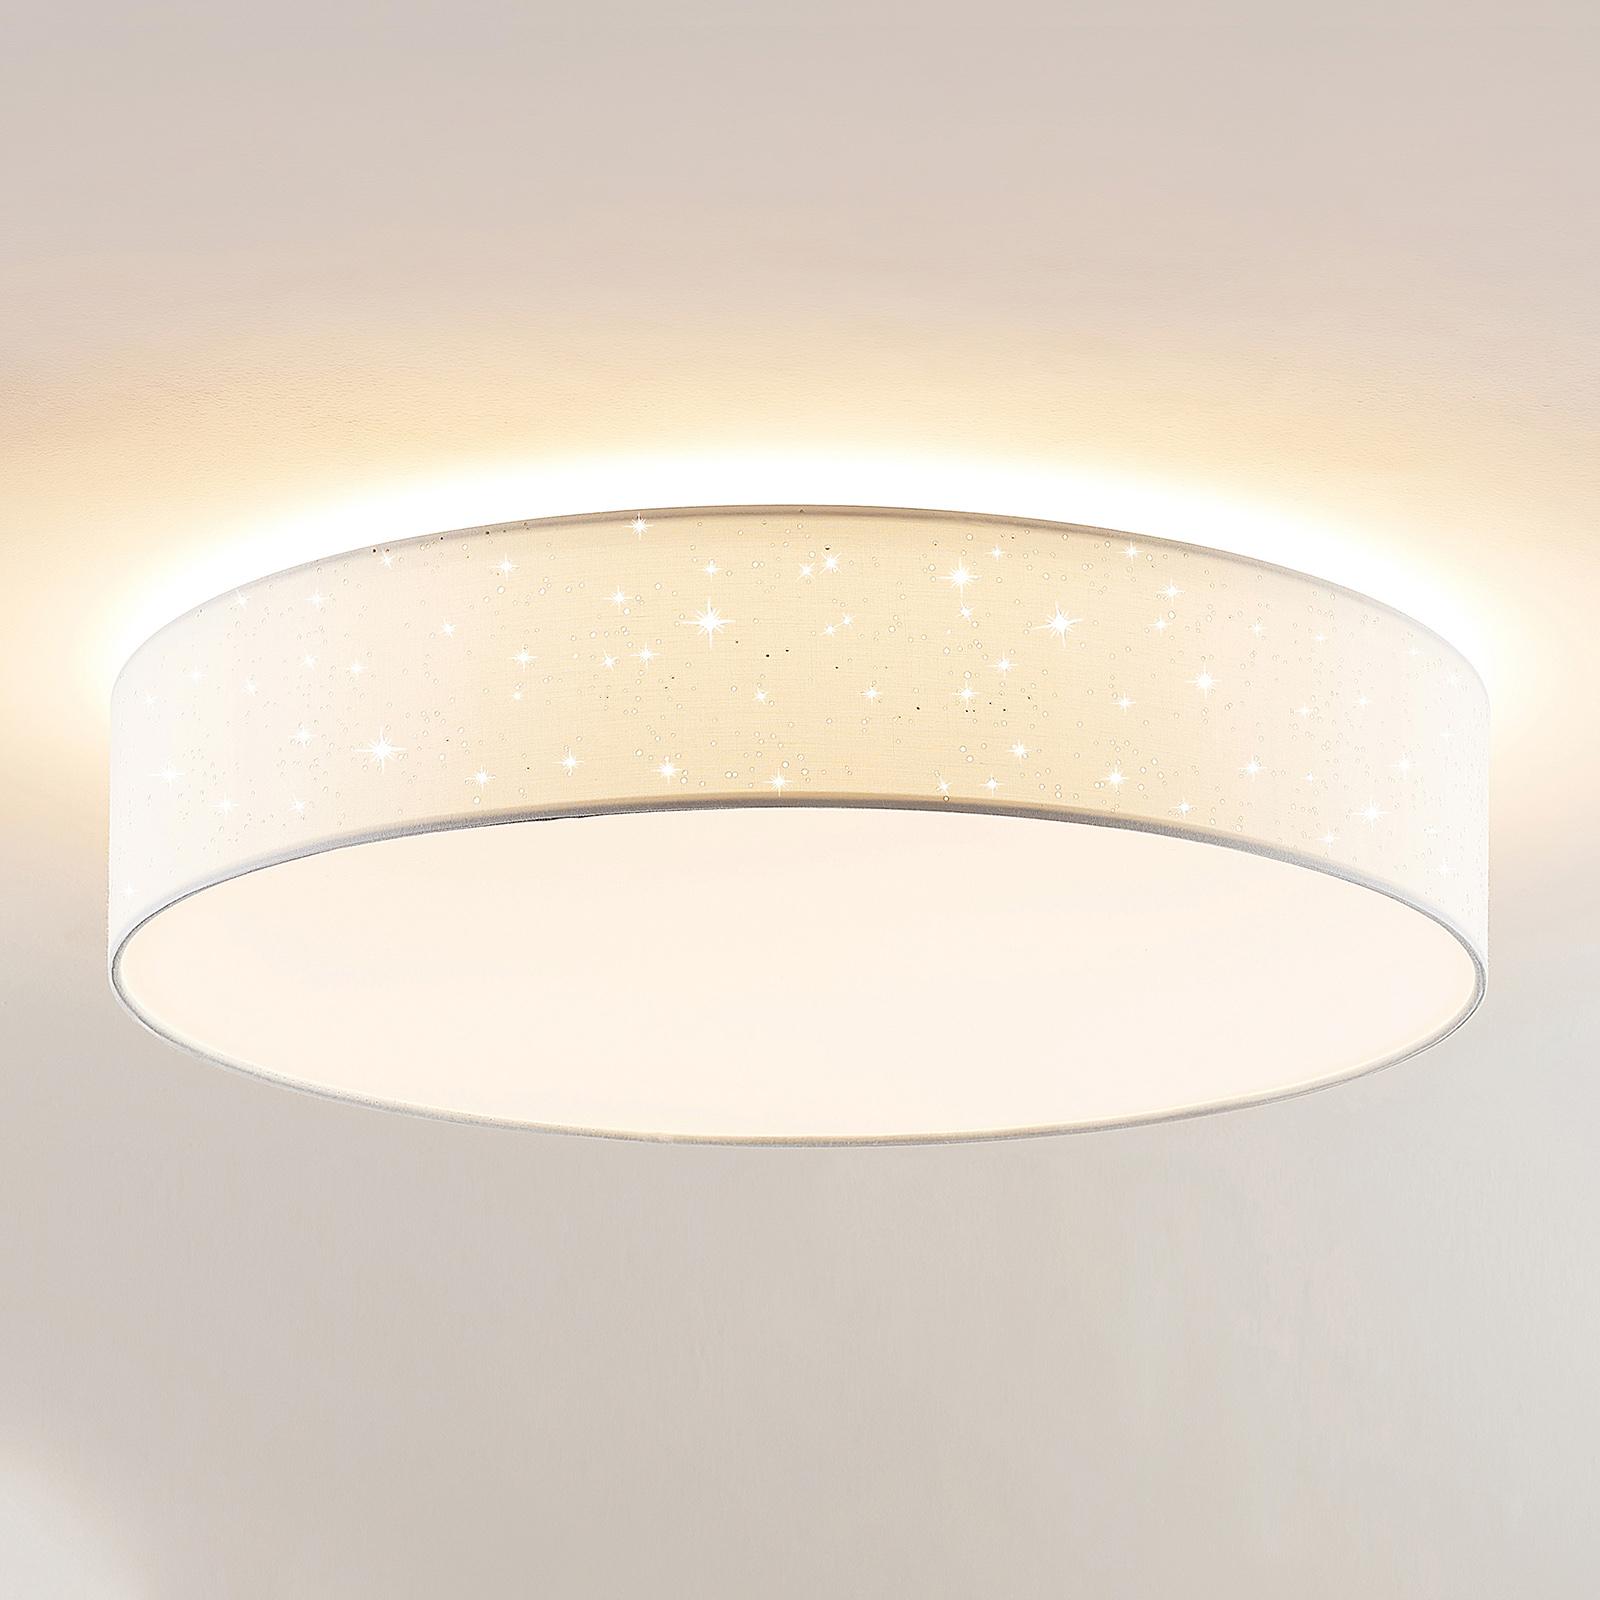 Lindby Ellamina lampa sufitowa LED 60 cm, biała